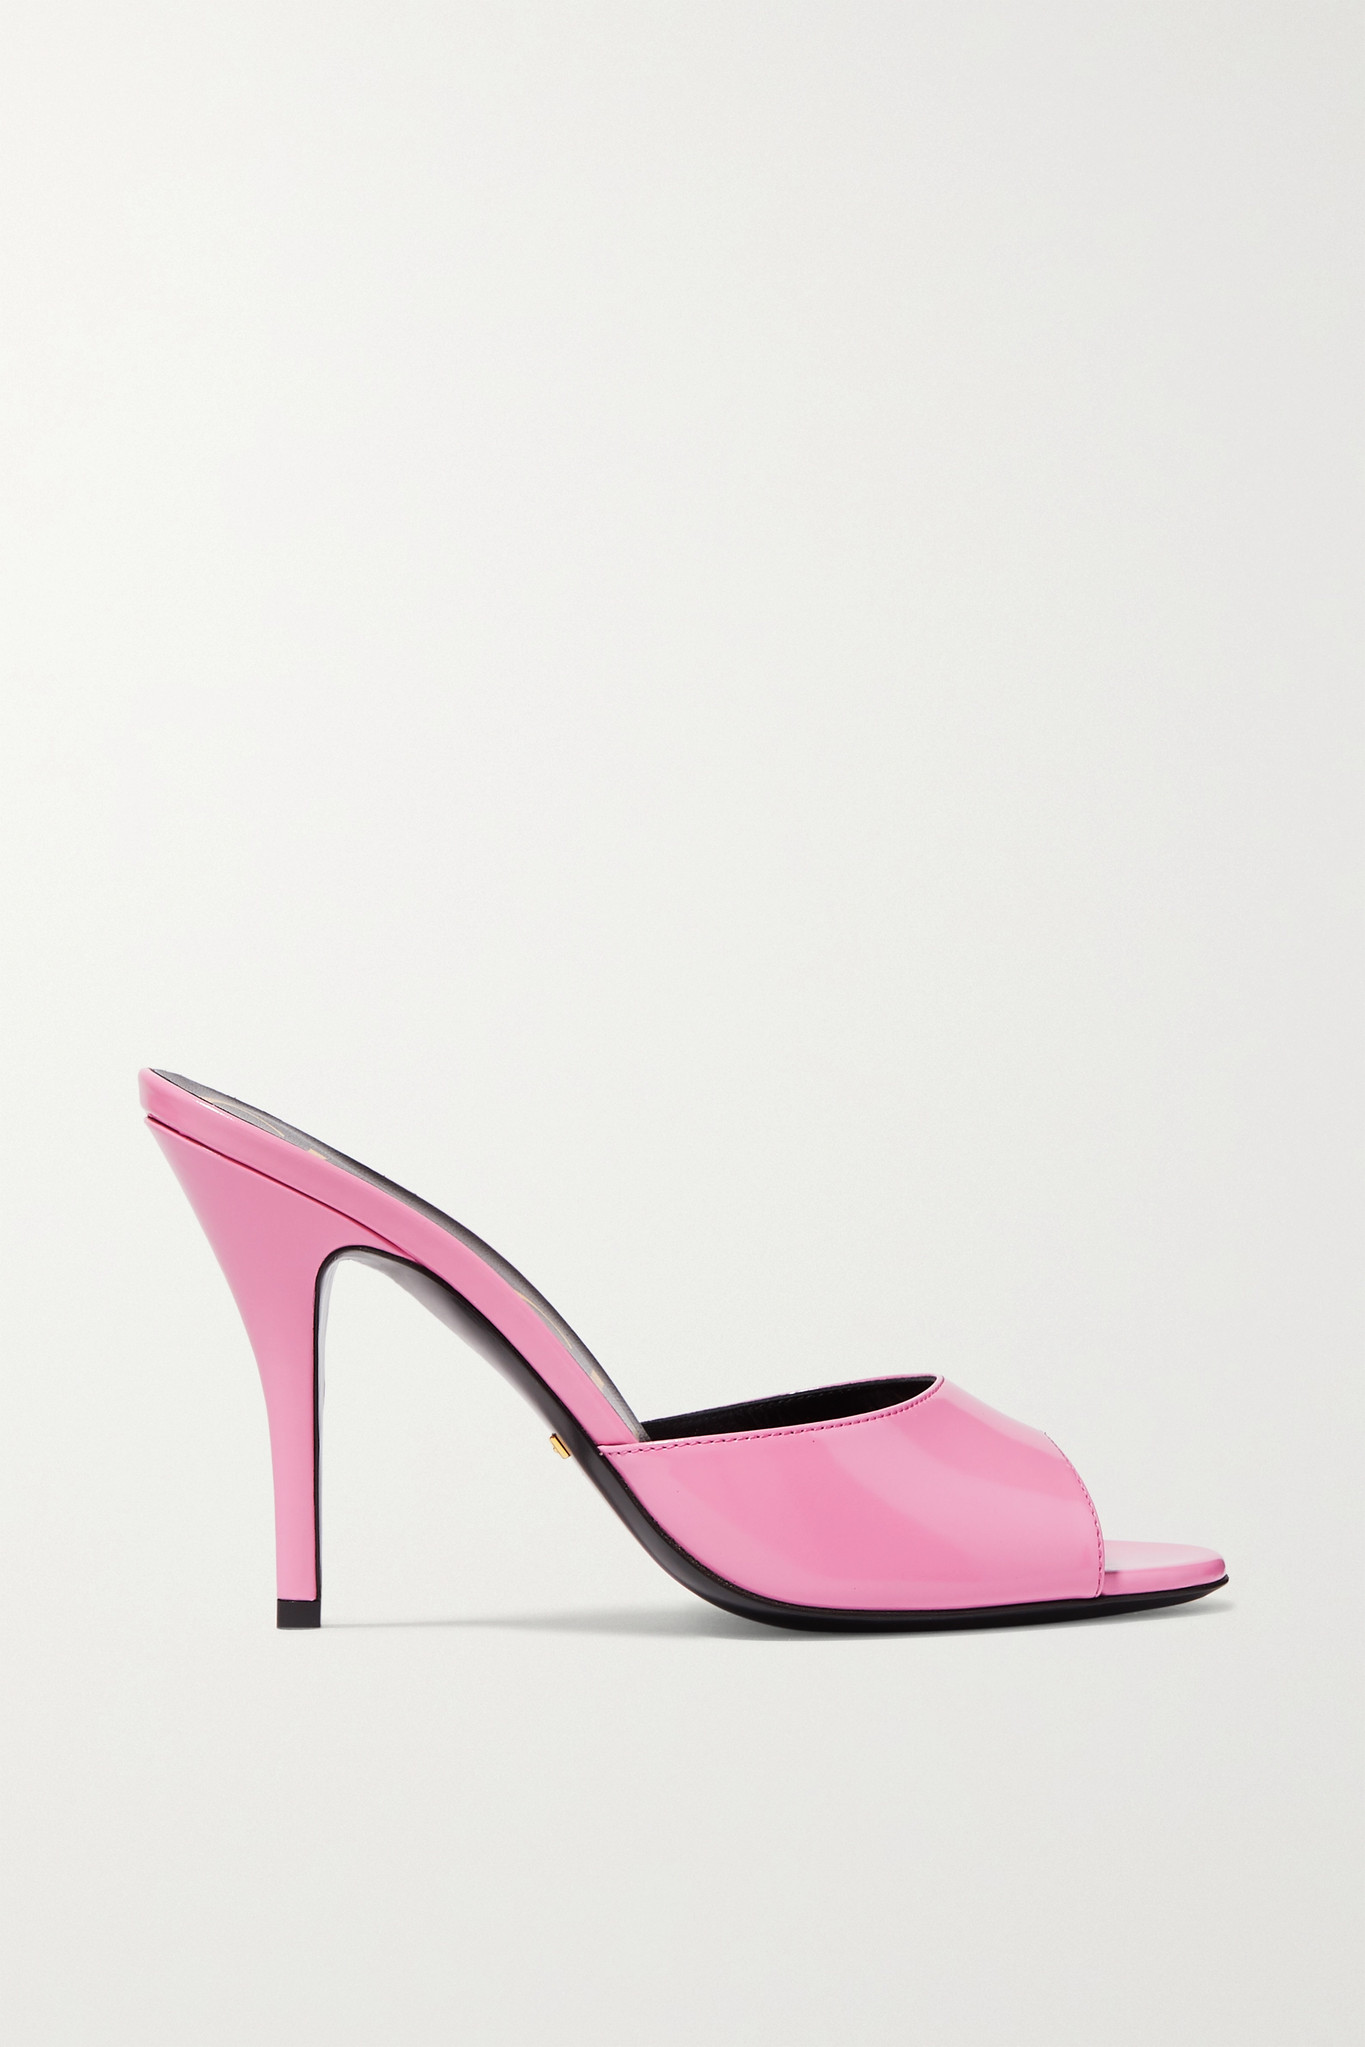 GUCCI - Scarlet 亮面皮革穆勒鞋 - 粉红色 - IT35